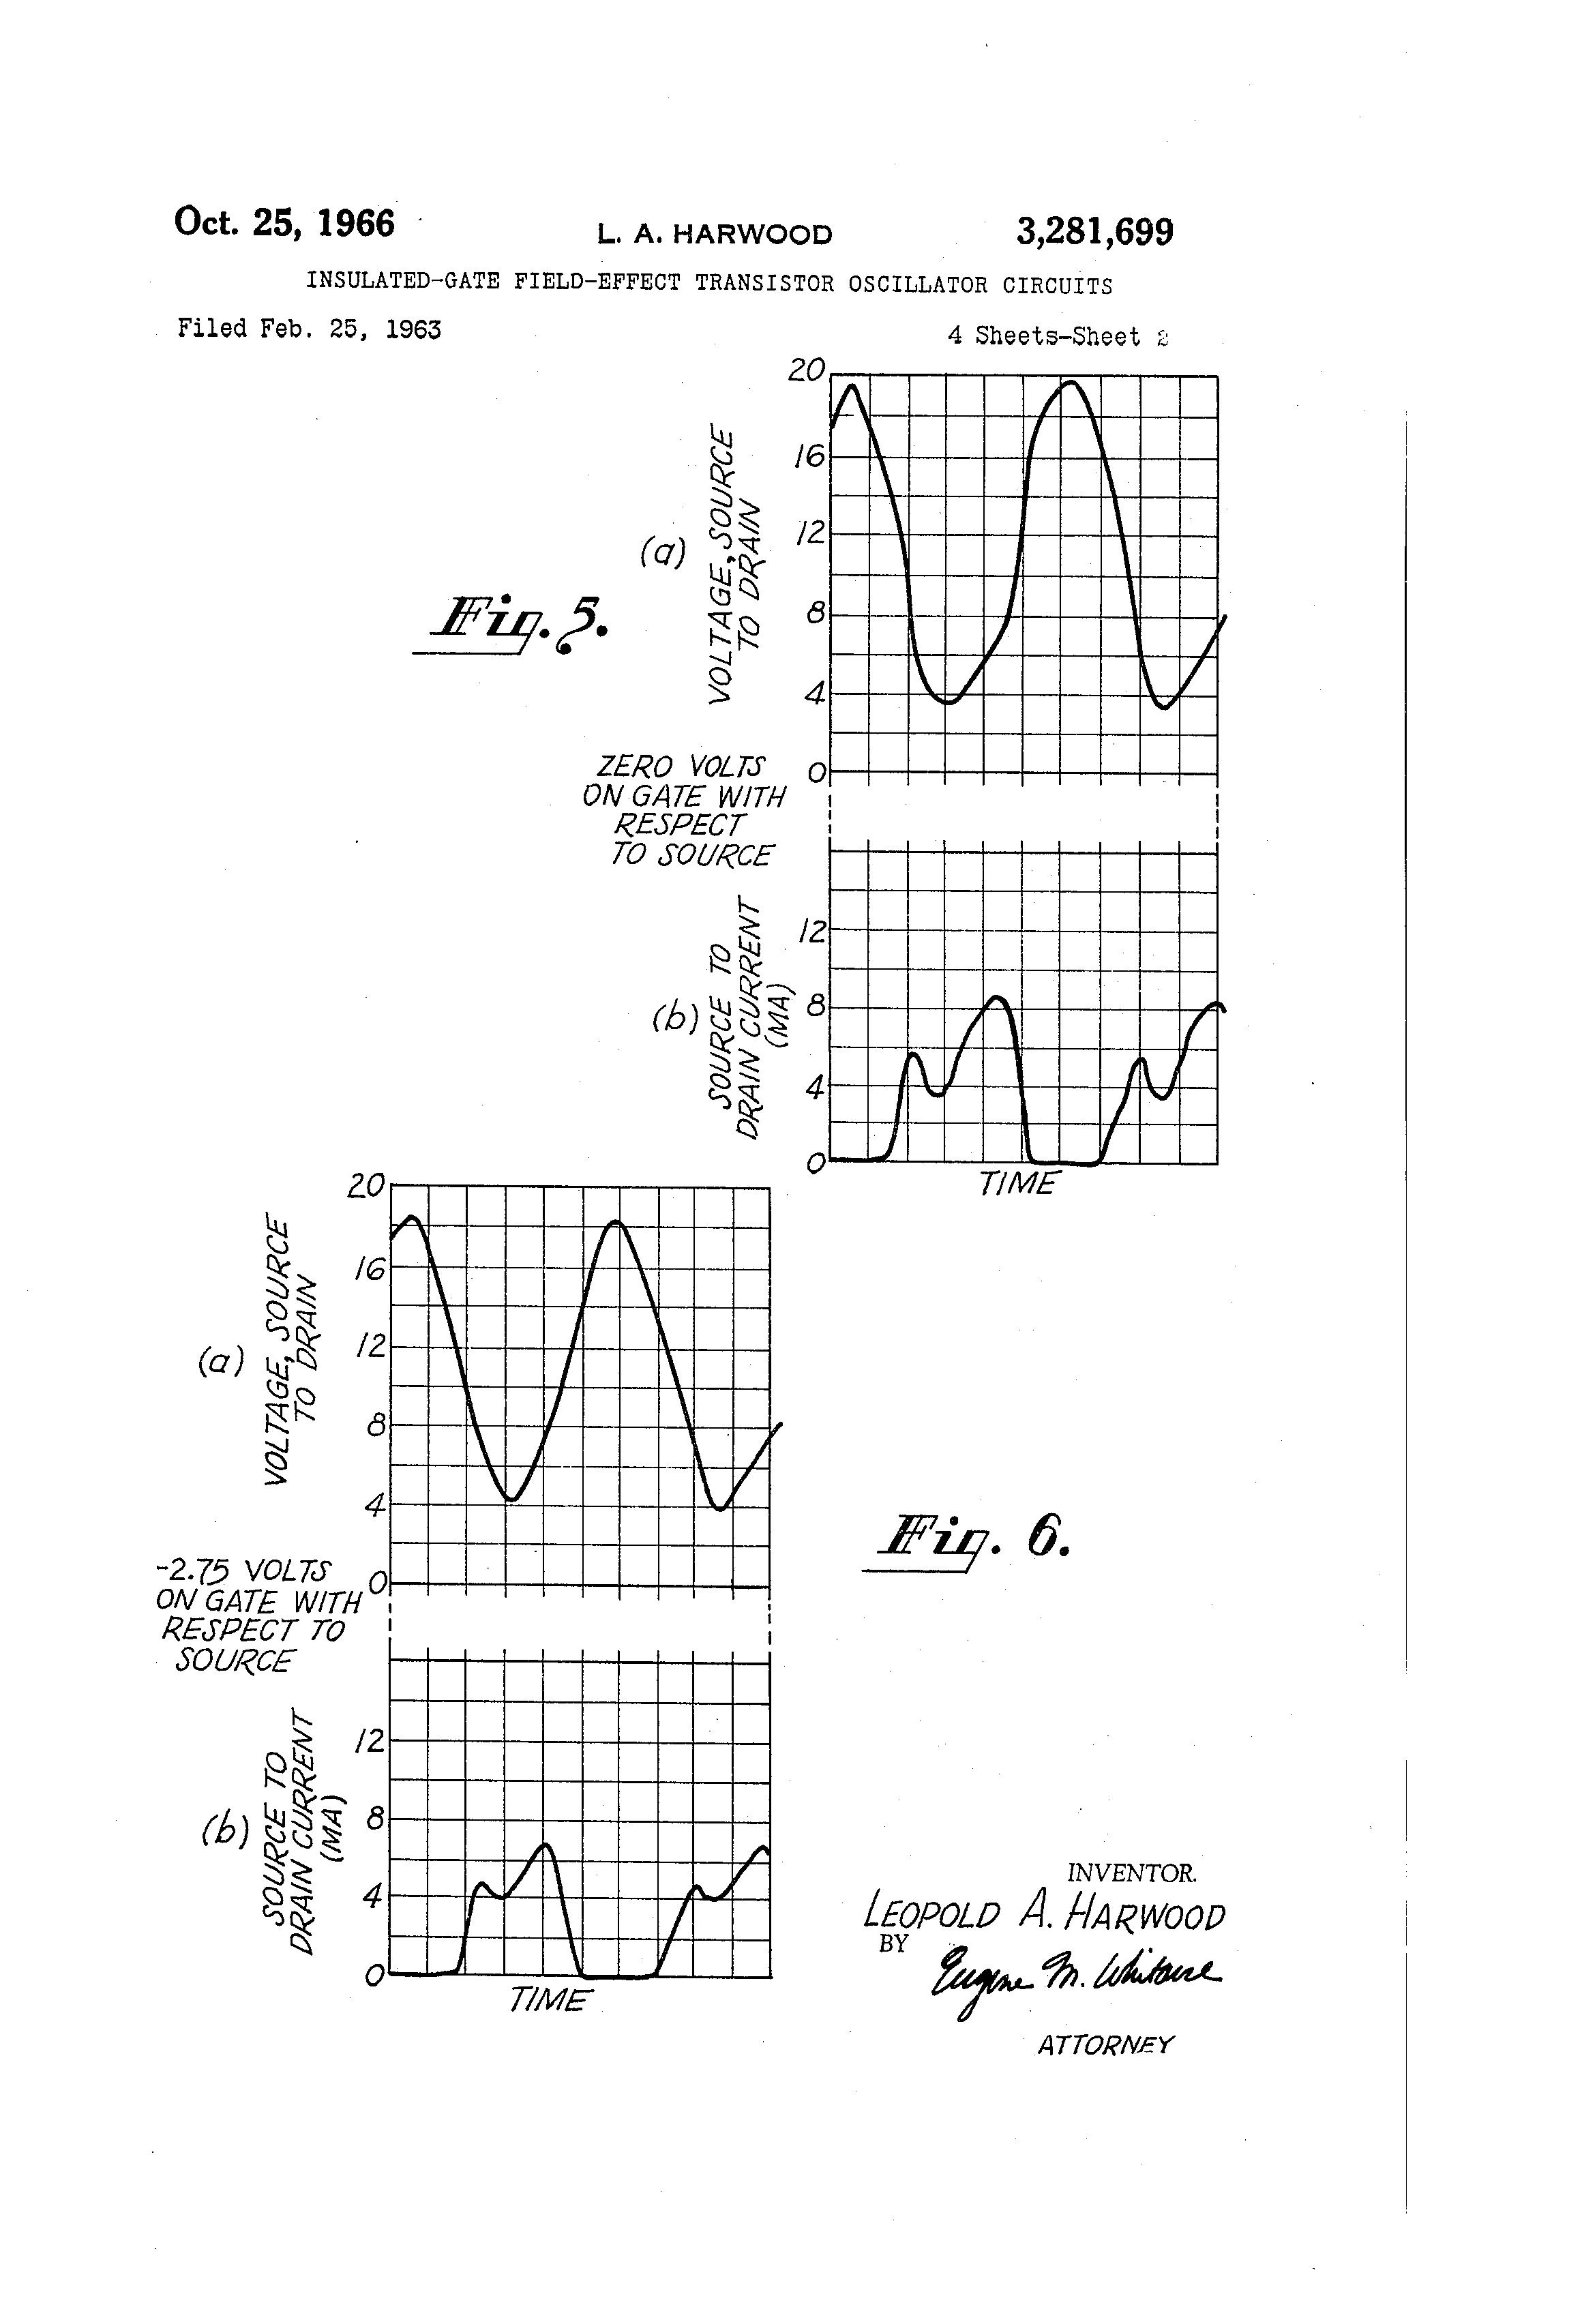 Patente Us3281699 Insulated Gate Field Effect Transistor Basic Oscillator Circuit Patent Drawing